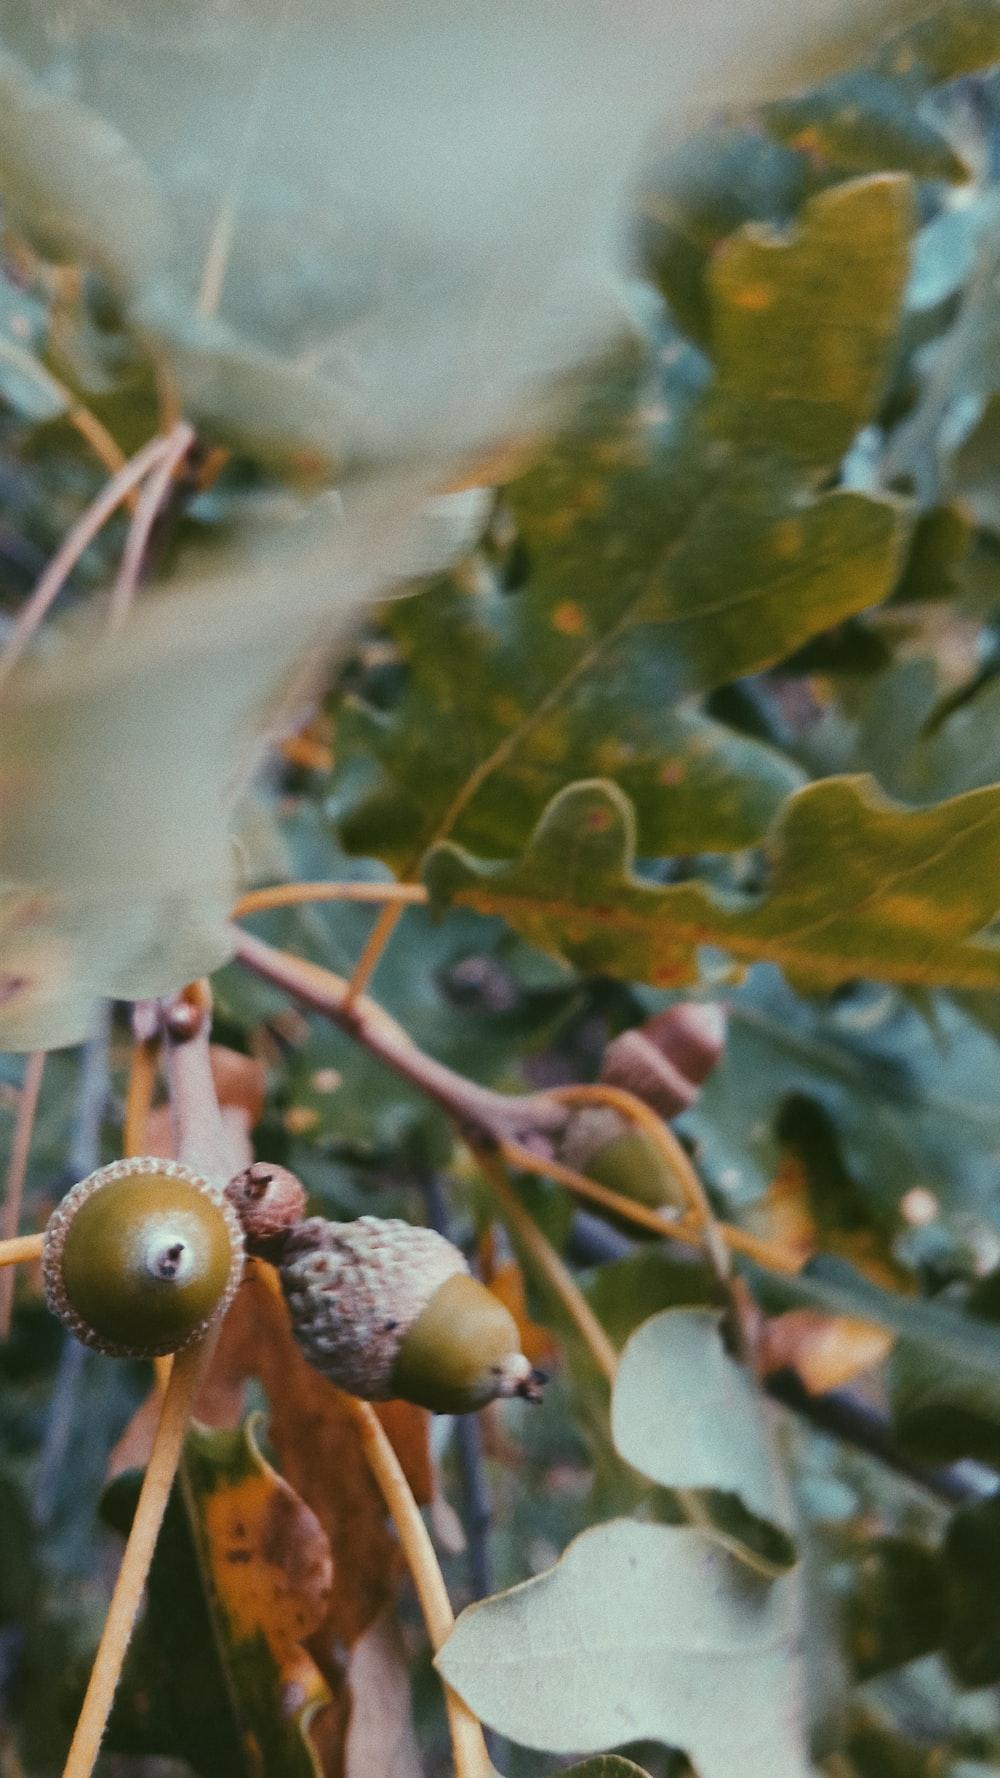 round green fruits